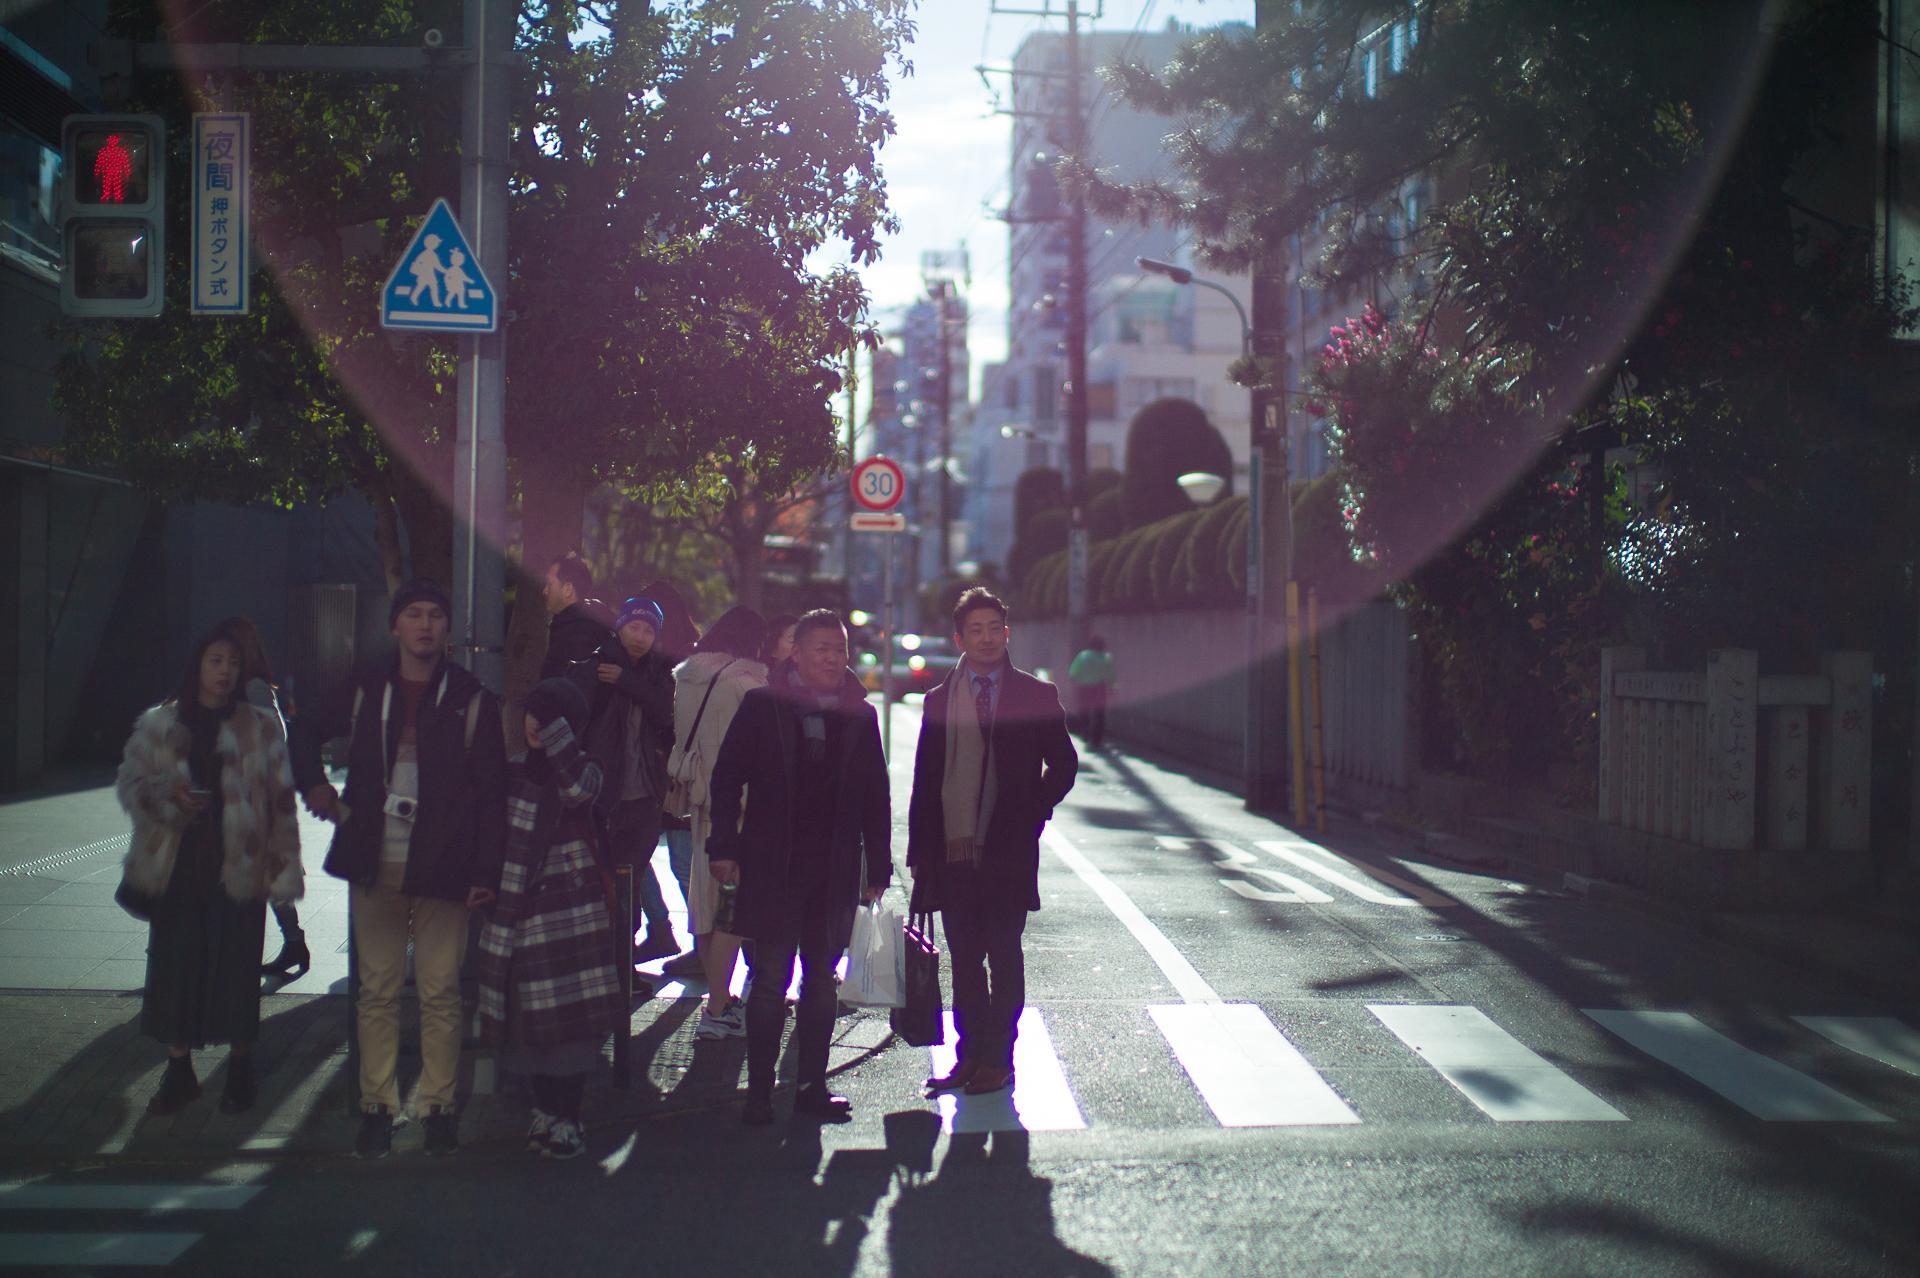 Men's fashion in Minami Aoyama © 2018 Jerry Yang